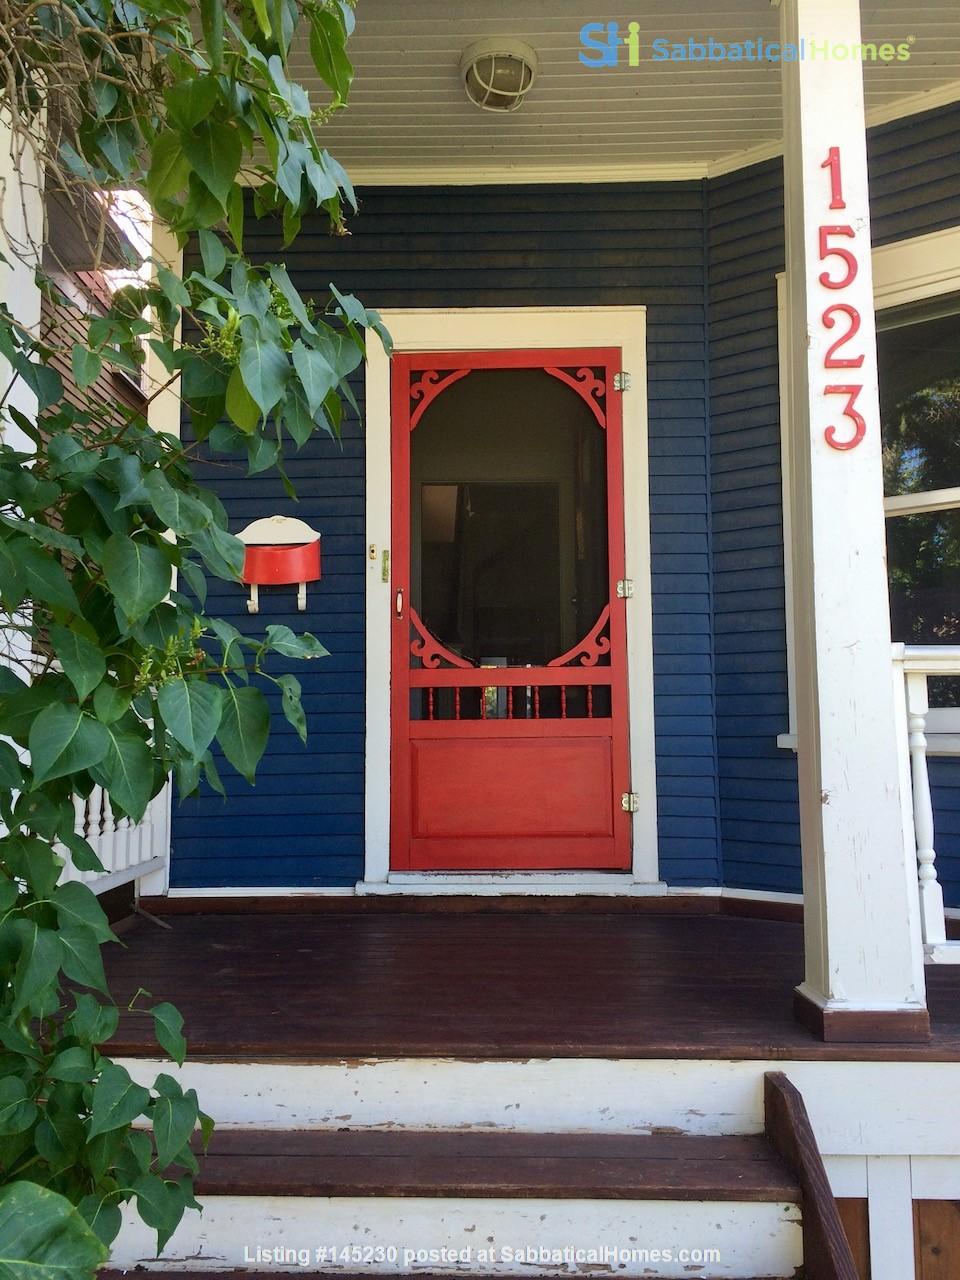 Beautiful historic home in sought after Calgary neighbourhood Home Rental in Calgary, Alberta, Canada 6